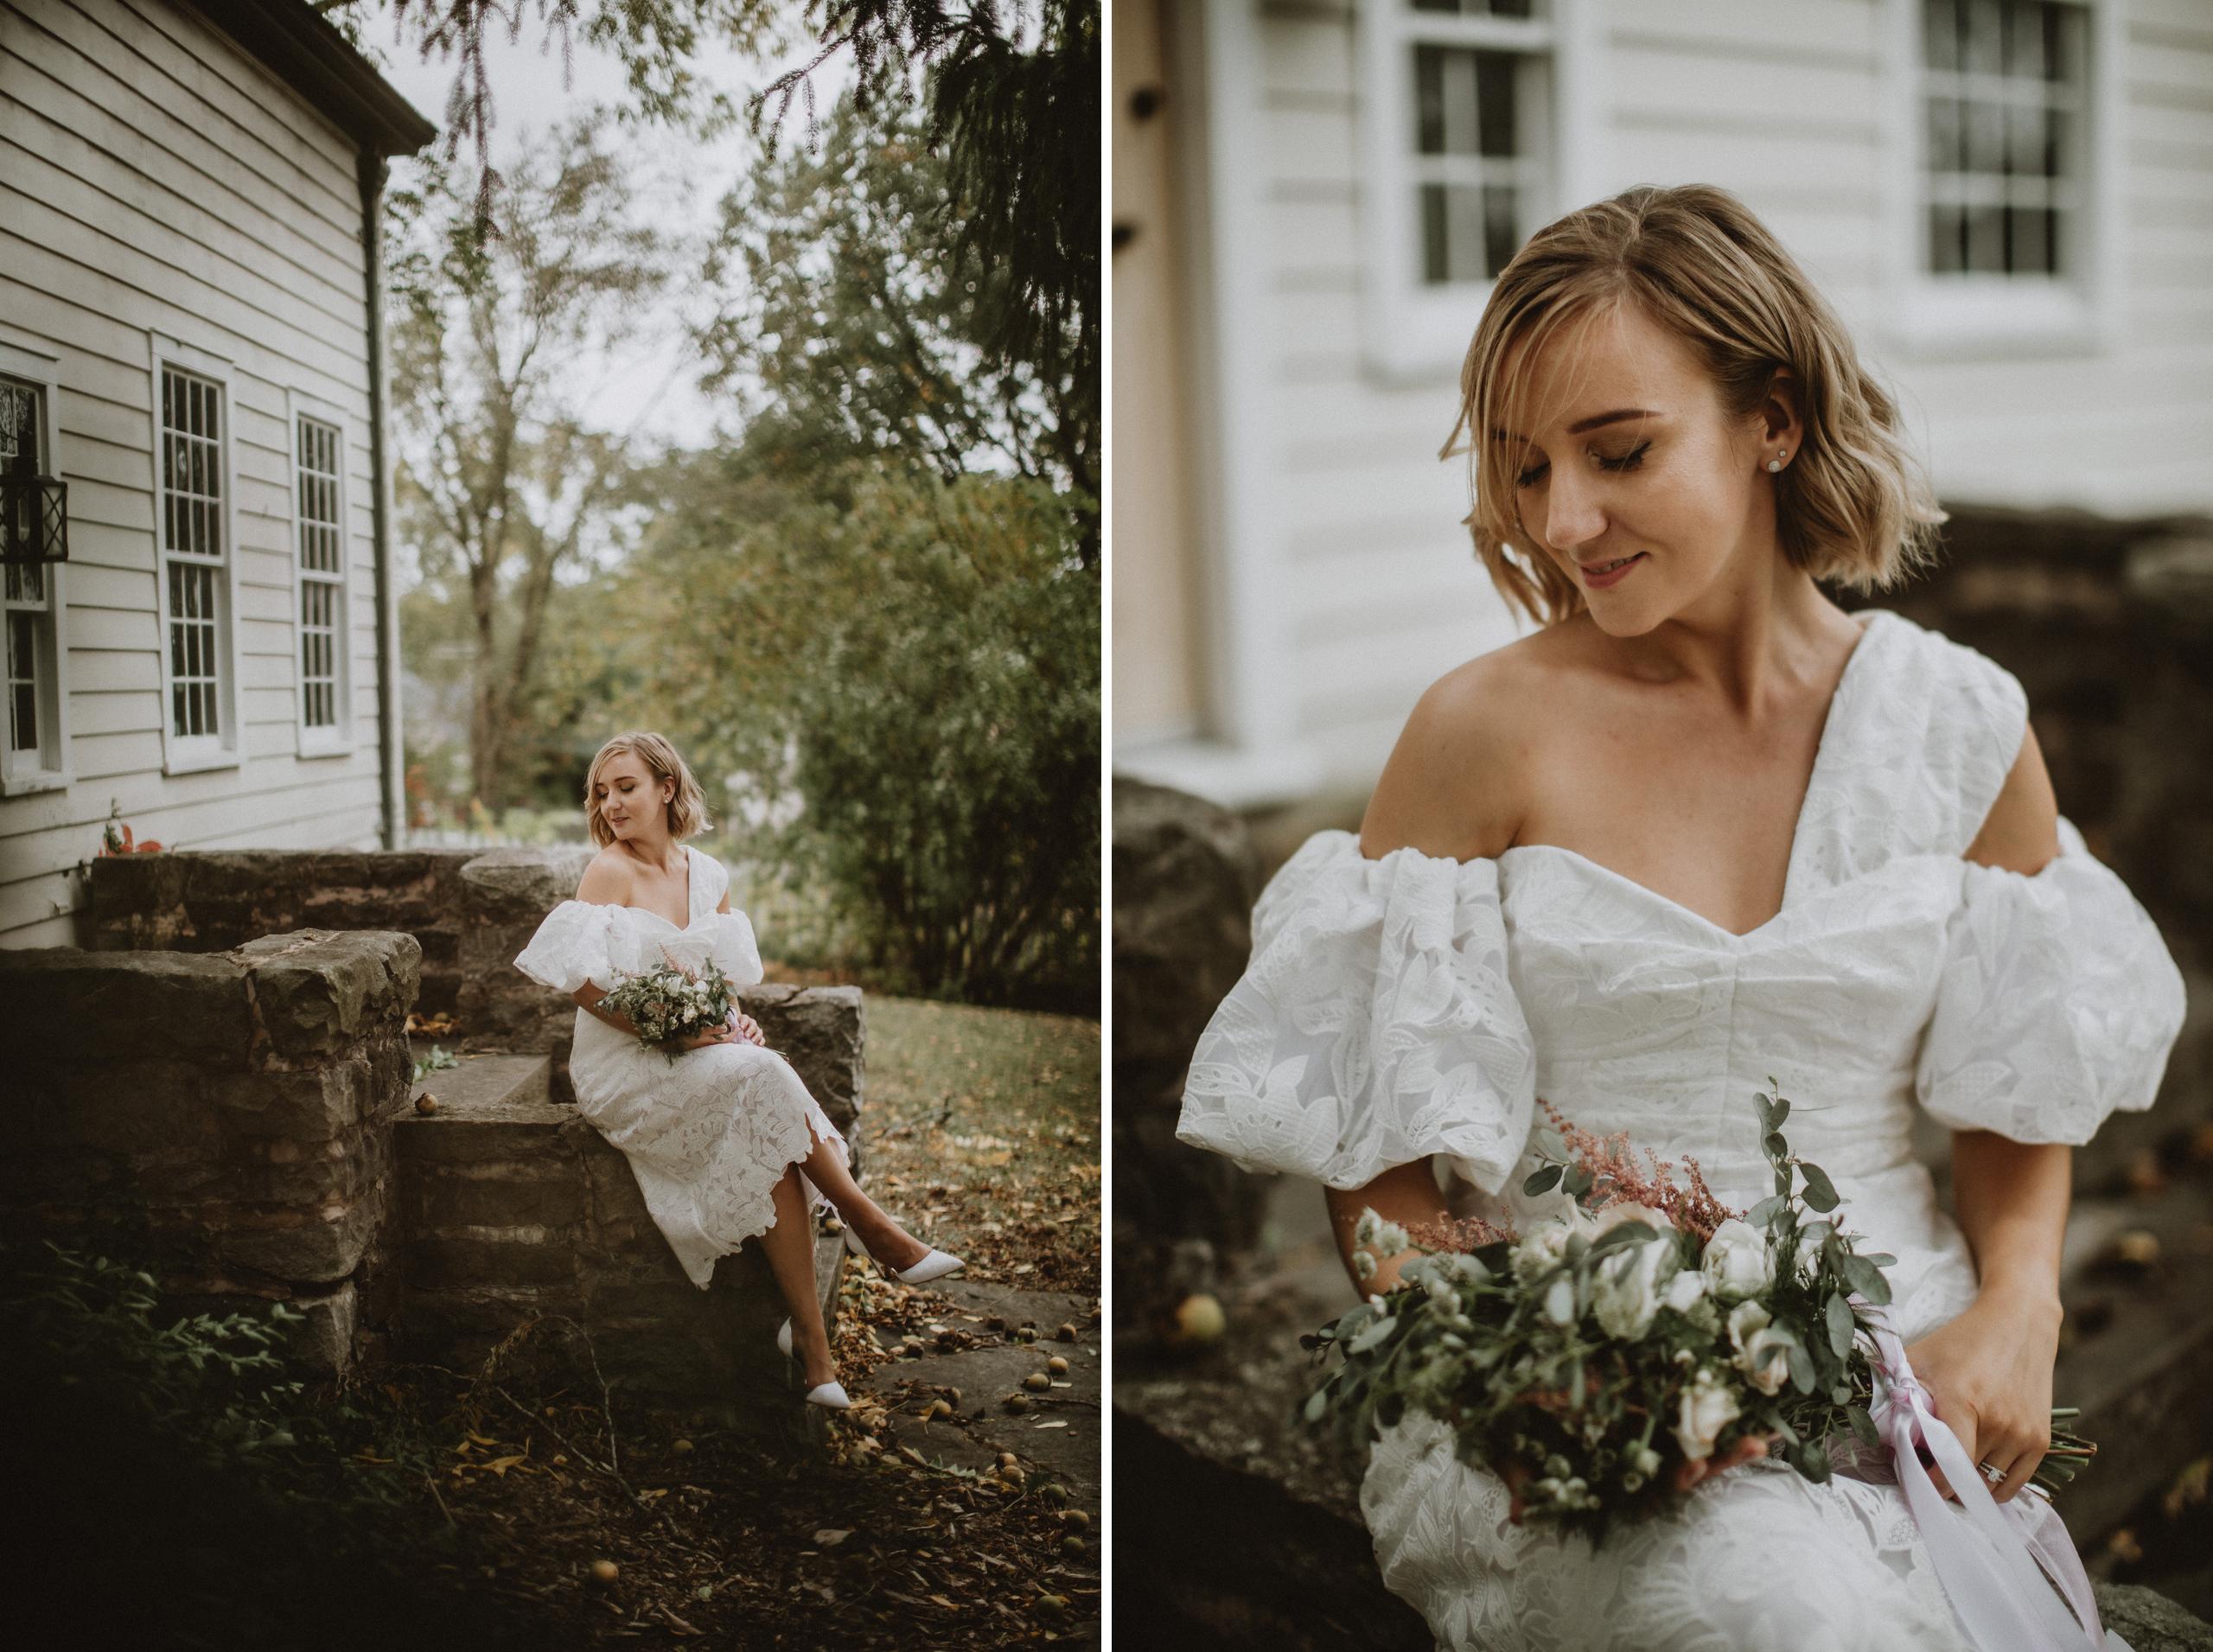 unique wedding dress niagara bbblooms florals afterglow photographer